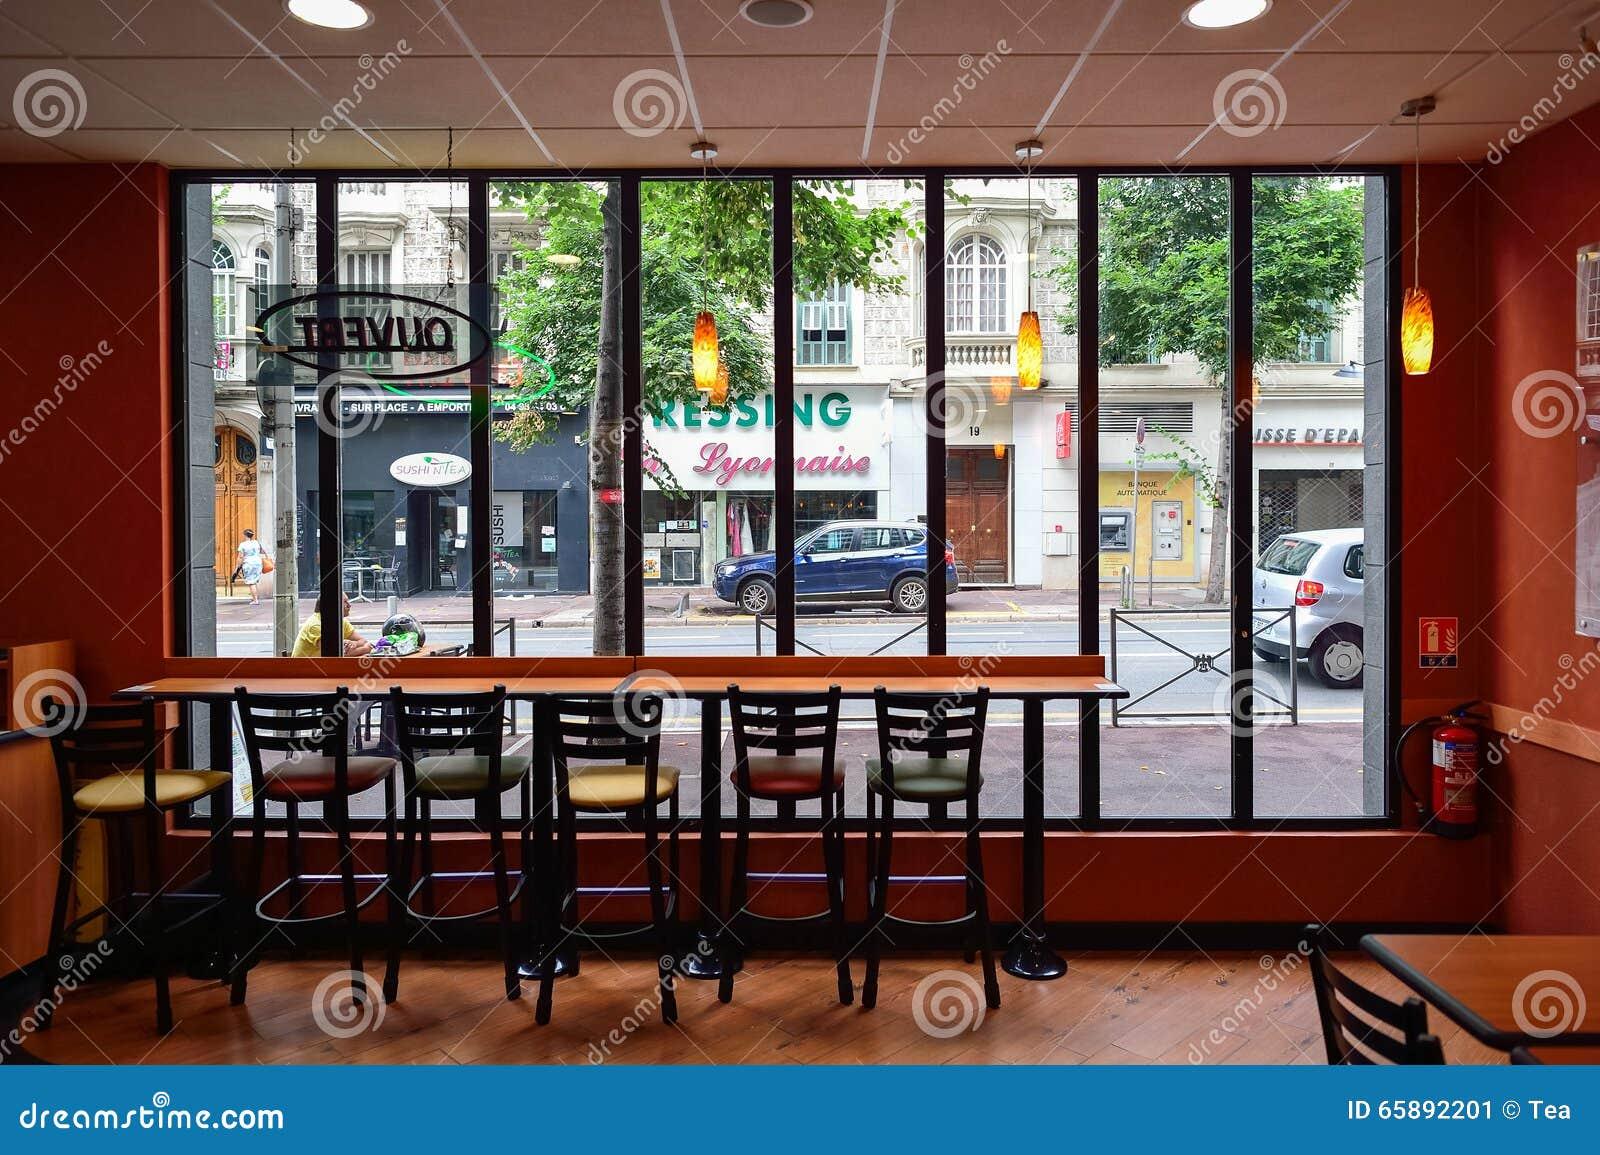 Subway fast food restaurant interior